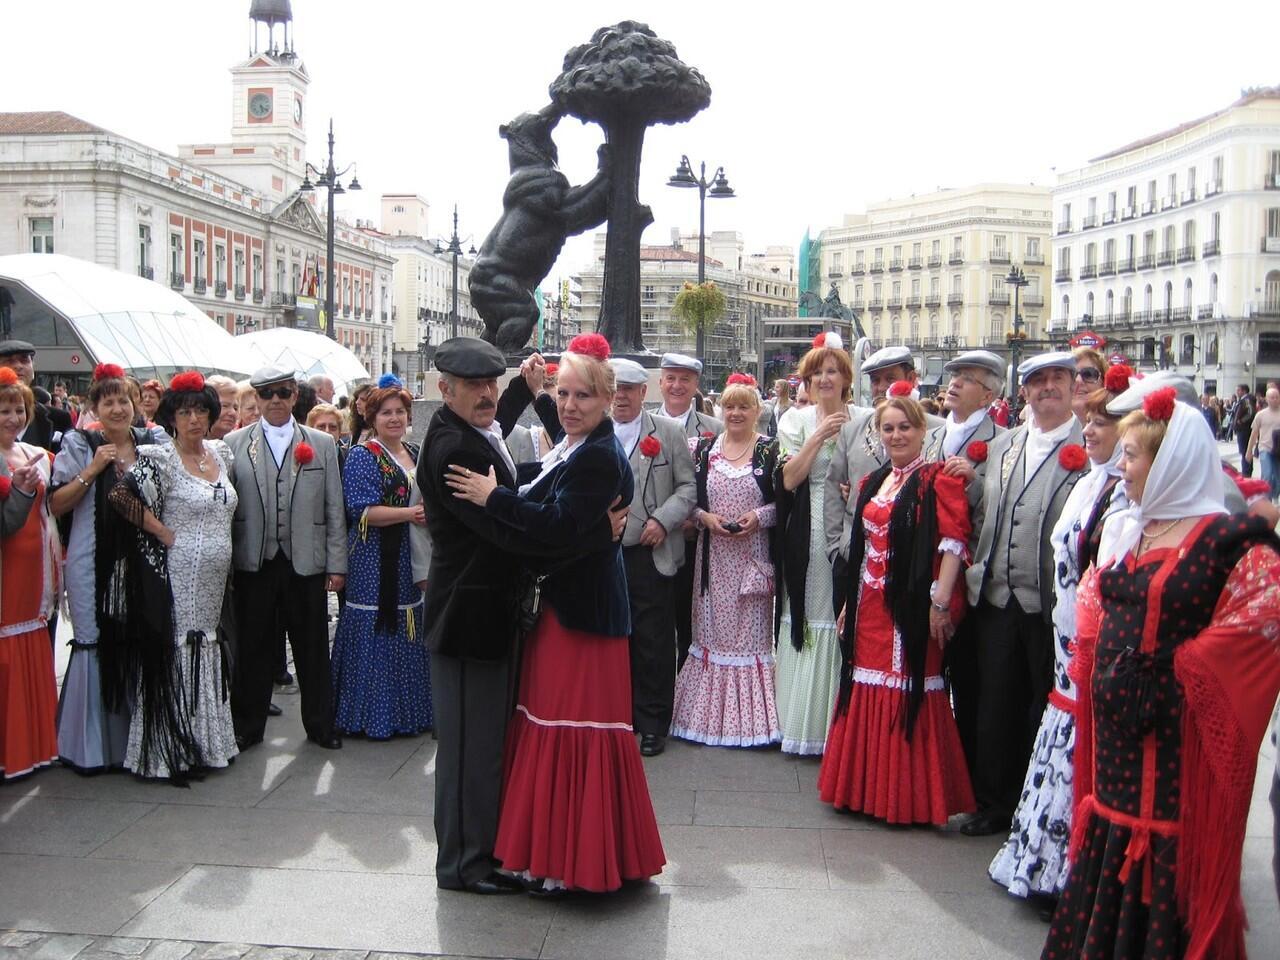 FESTIVITAS SAN ISIDRO DI MADRID